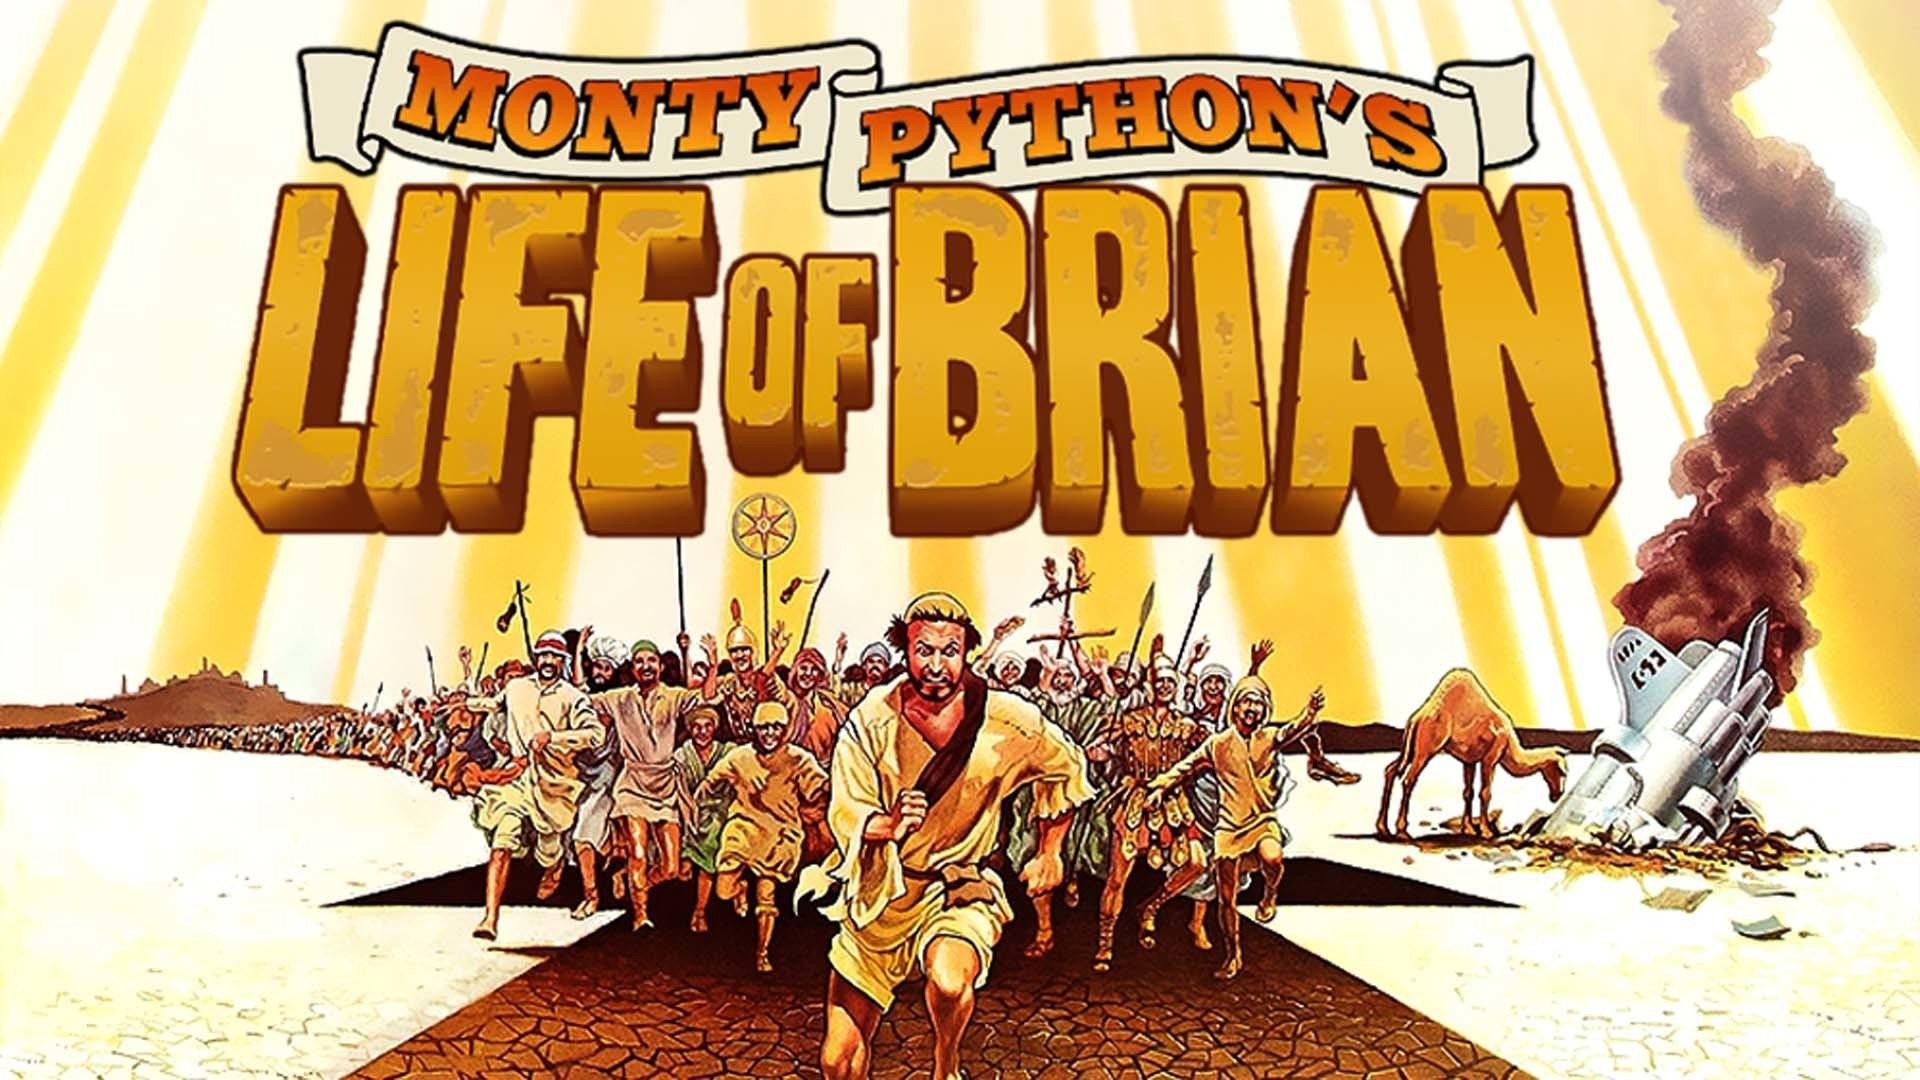 Cinema: Monty Python΄s Life of Brian (1979)